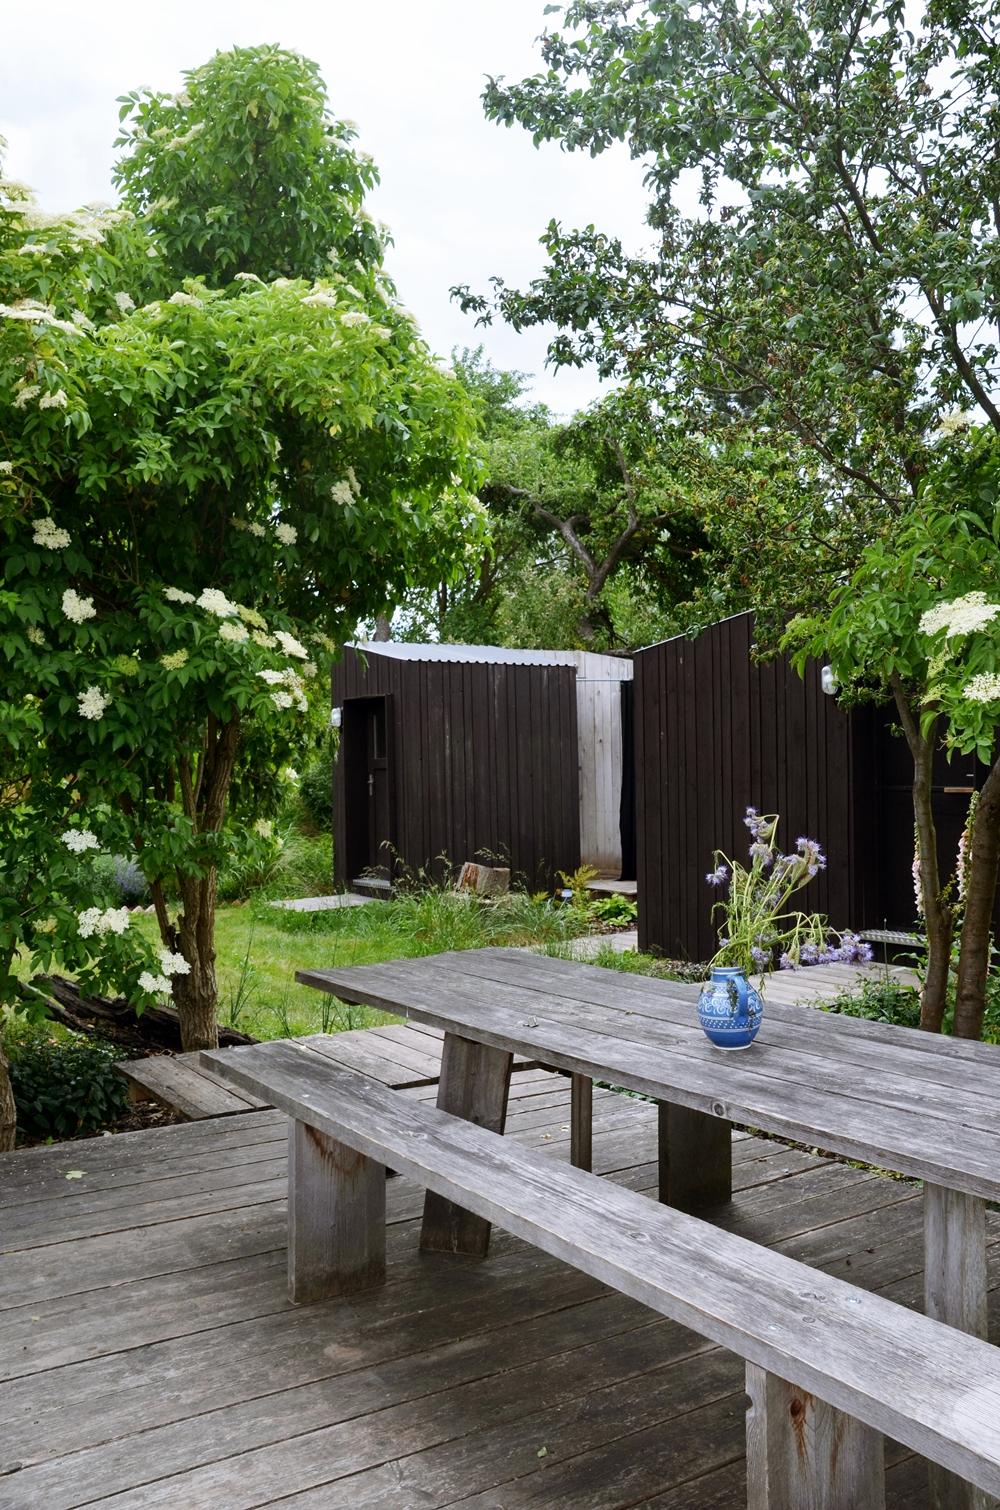 Black Cabin schwarze Tinyhouse